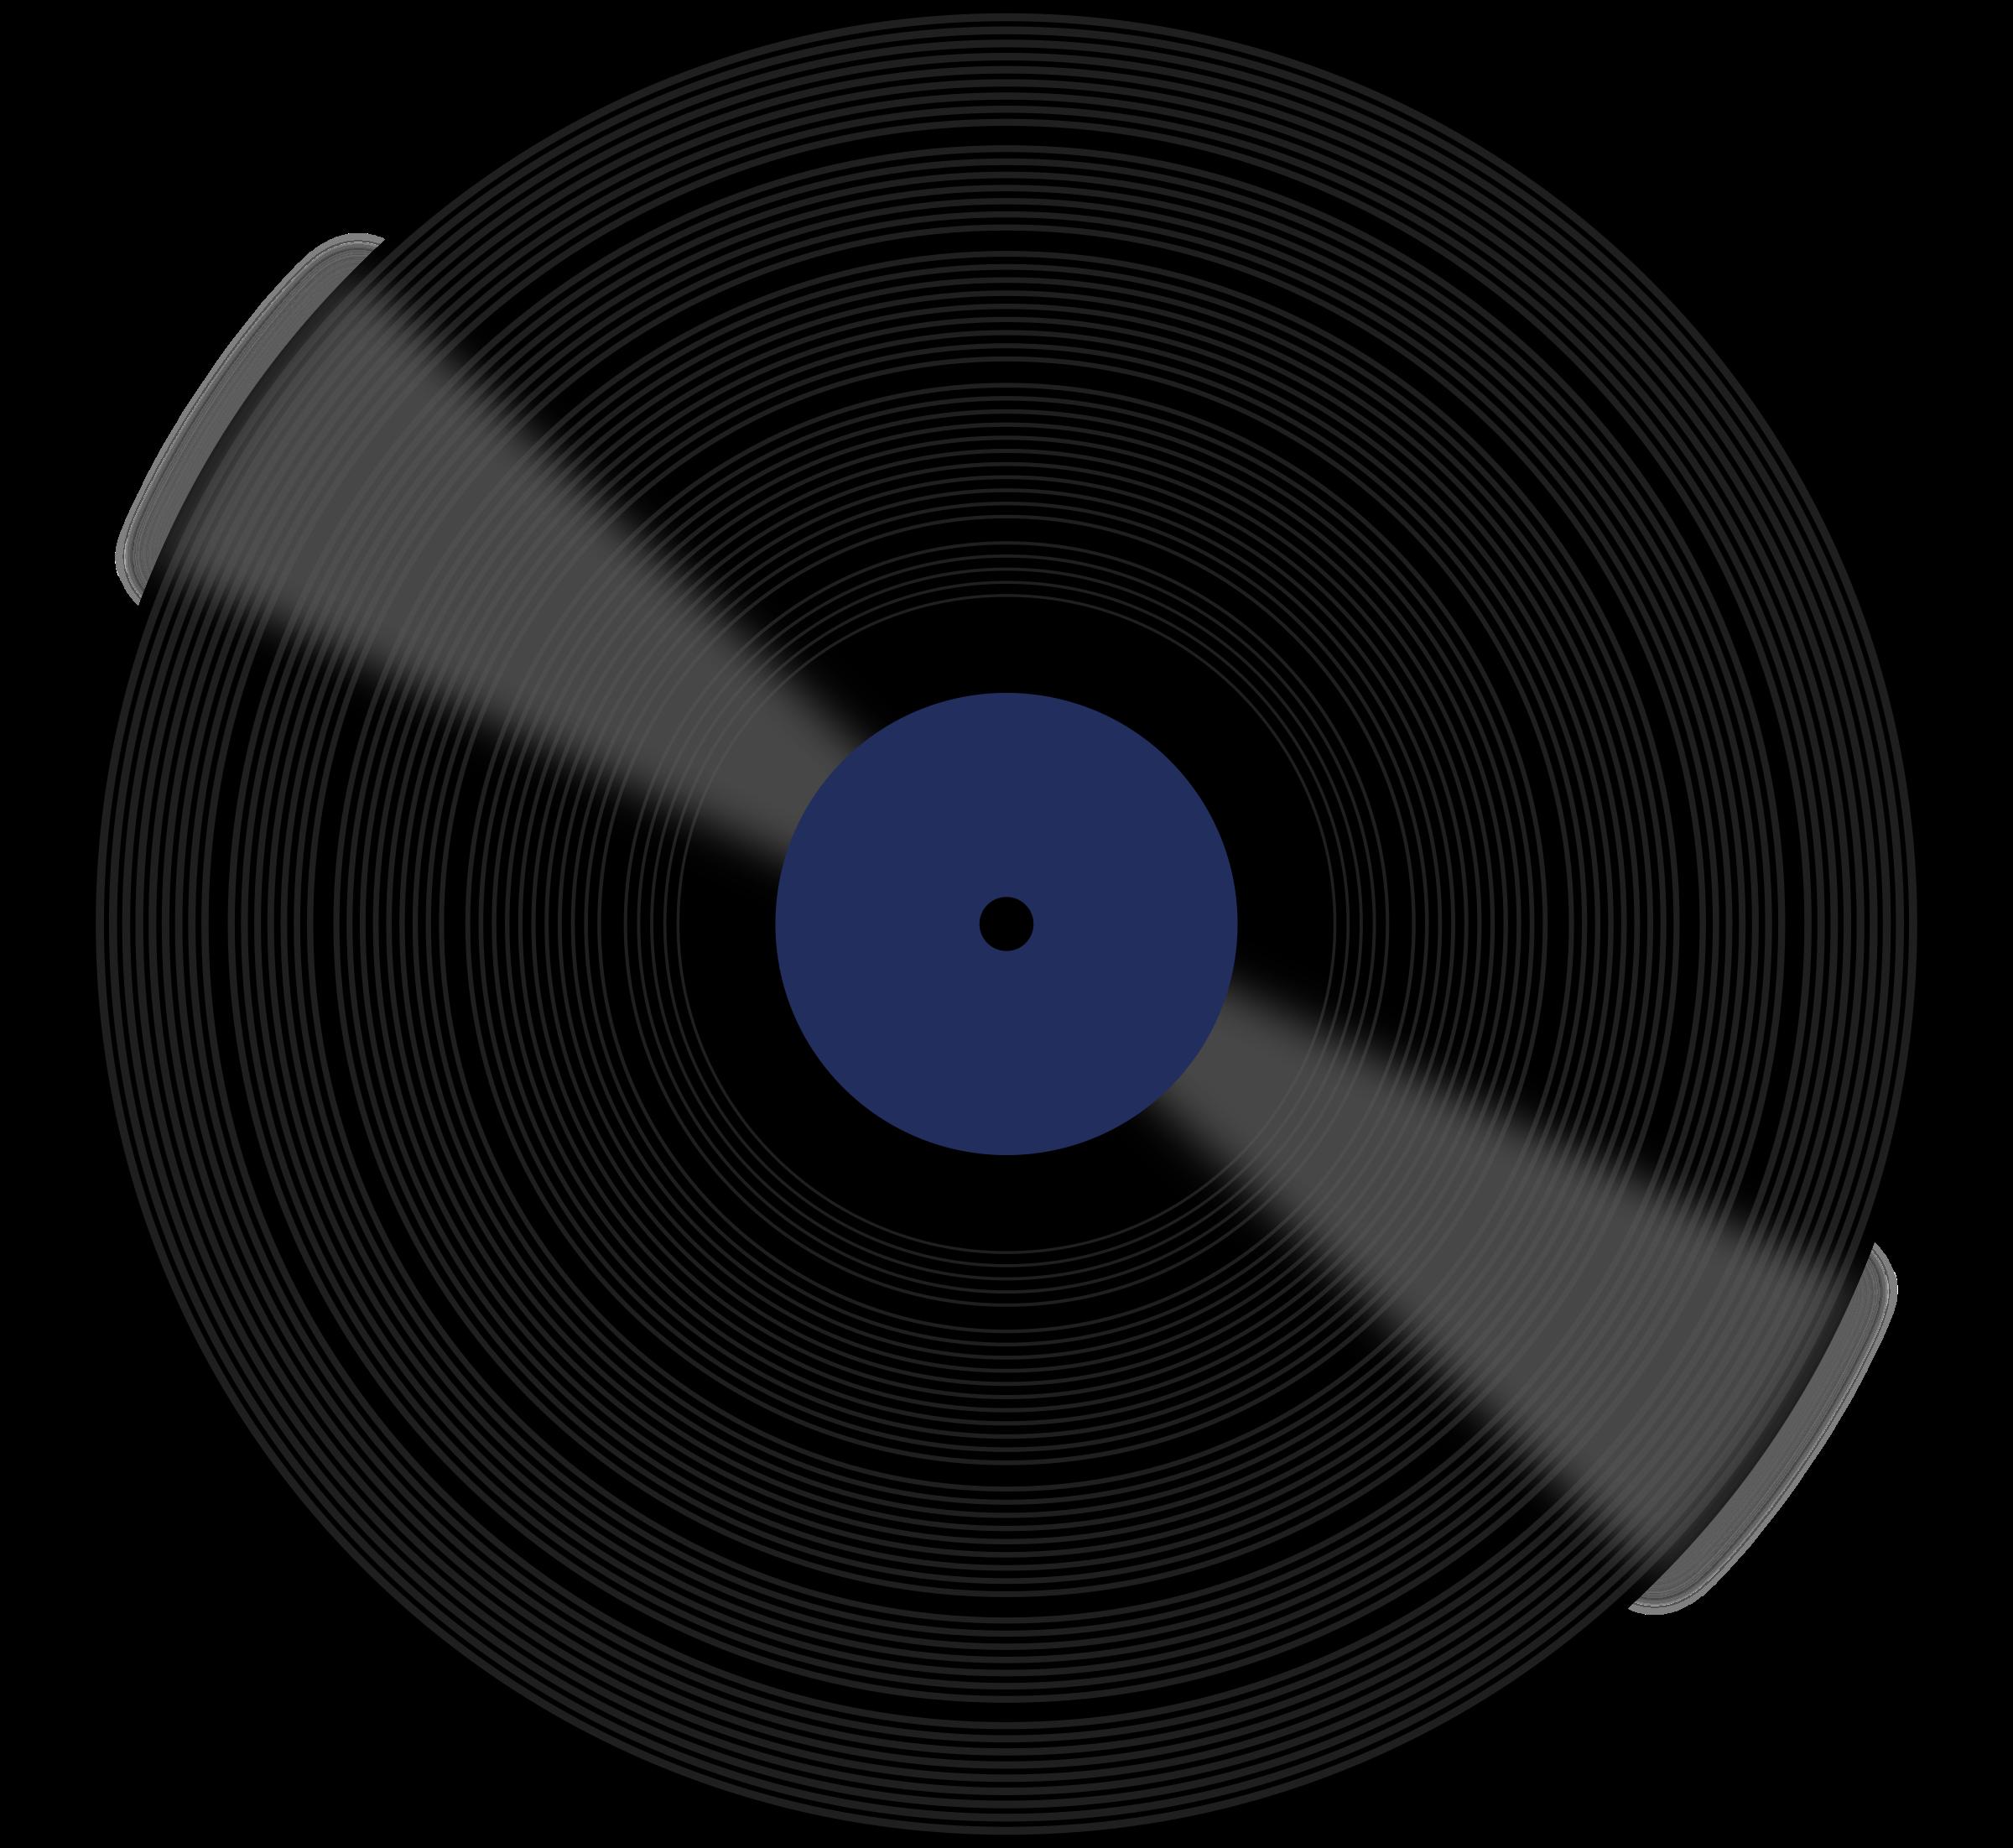 Big image png. Record clipart print